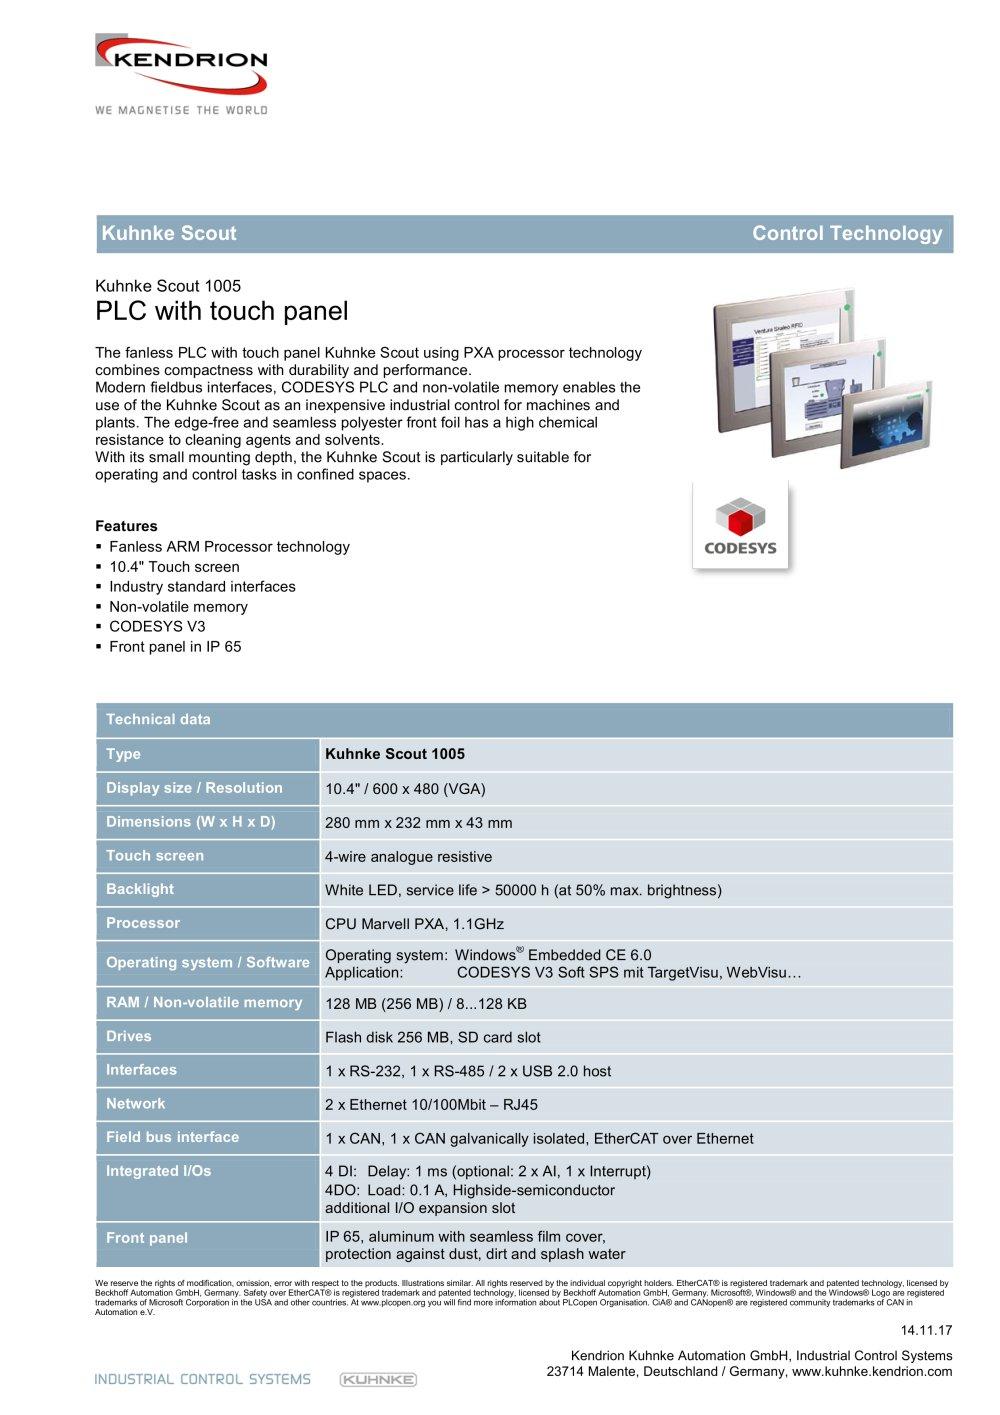 Kuhnke Scout 1005 - Kendrion Kuhnke Automation GmbH - PDF Catalogue ...